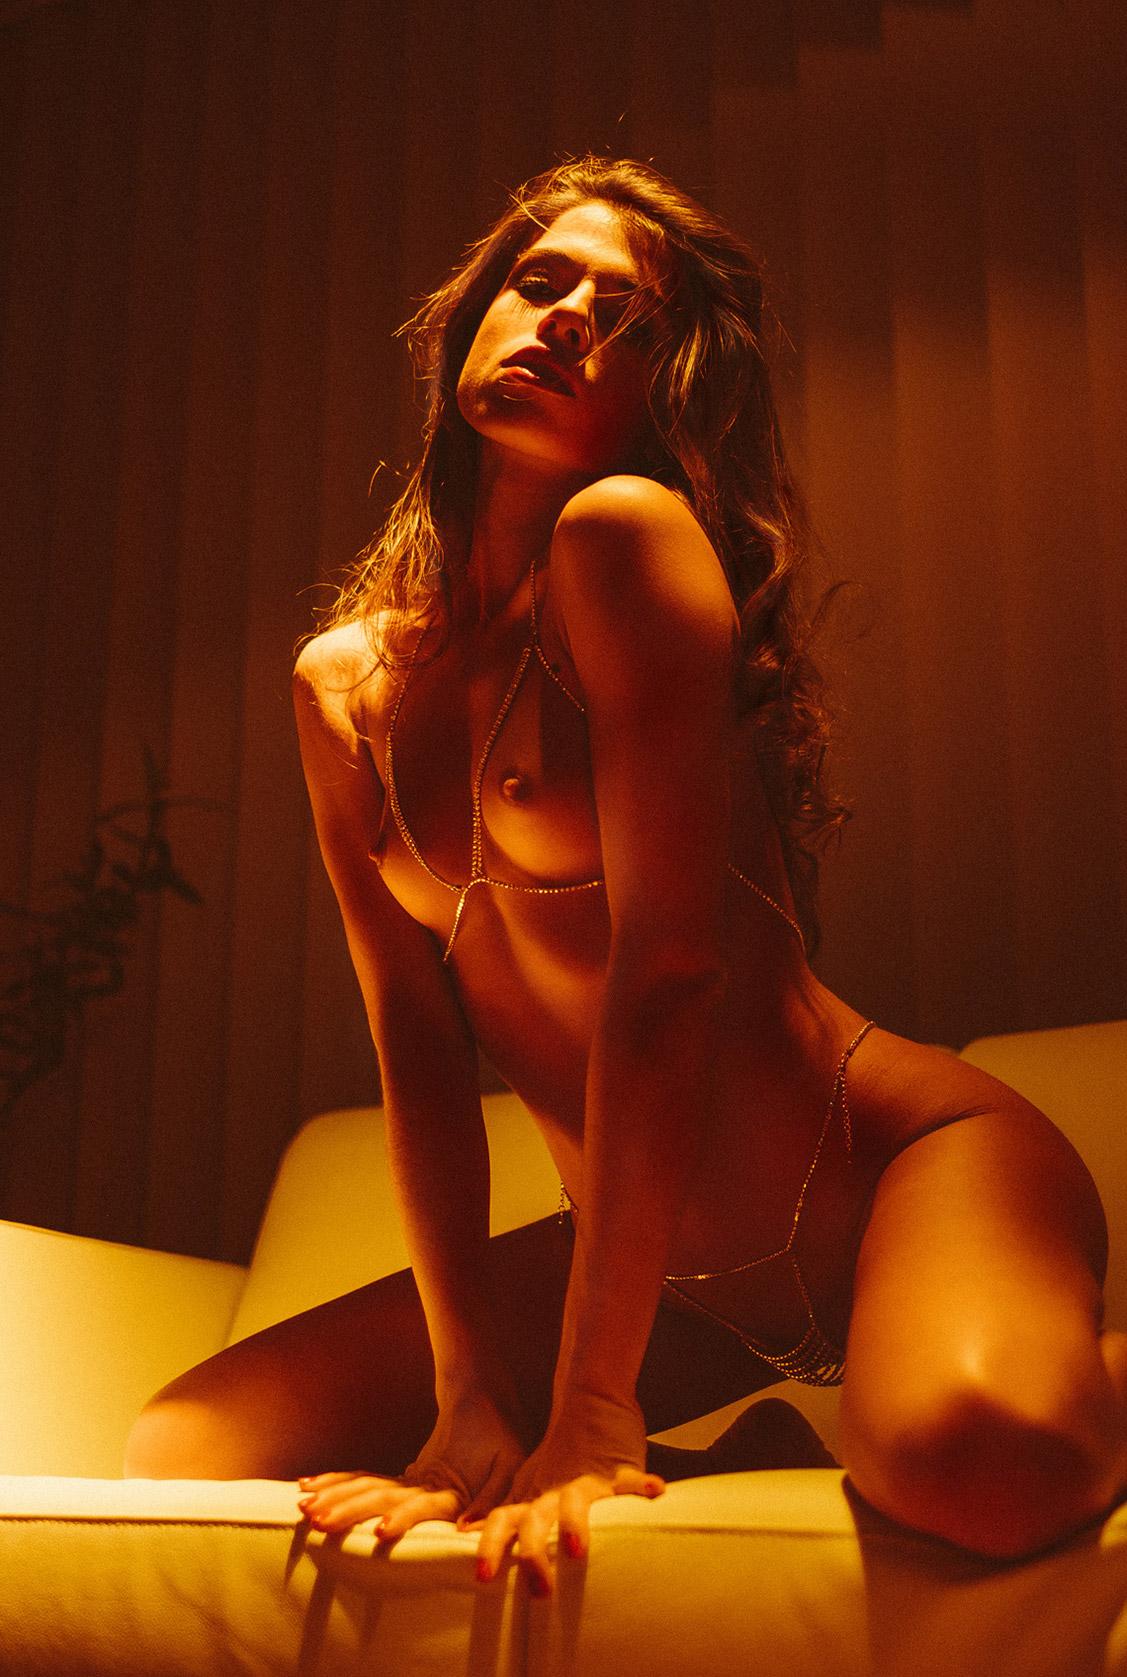 Nightcrawlers - Chiara Bianchino nude by Julien LRVR / Yume Magazine